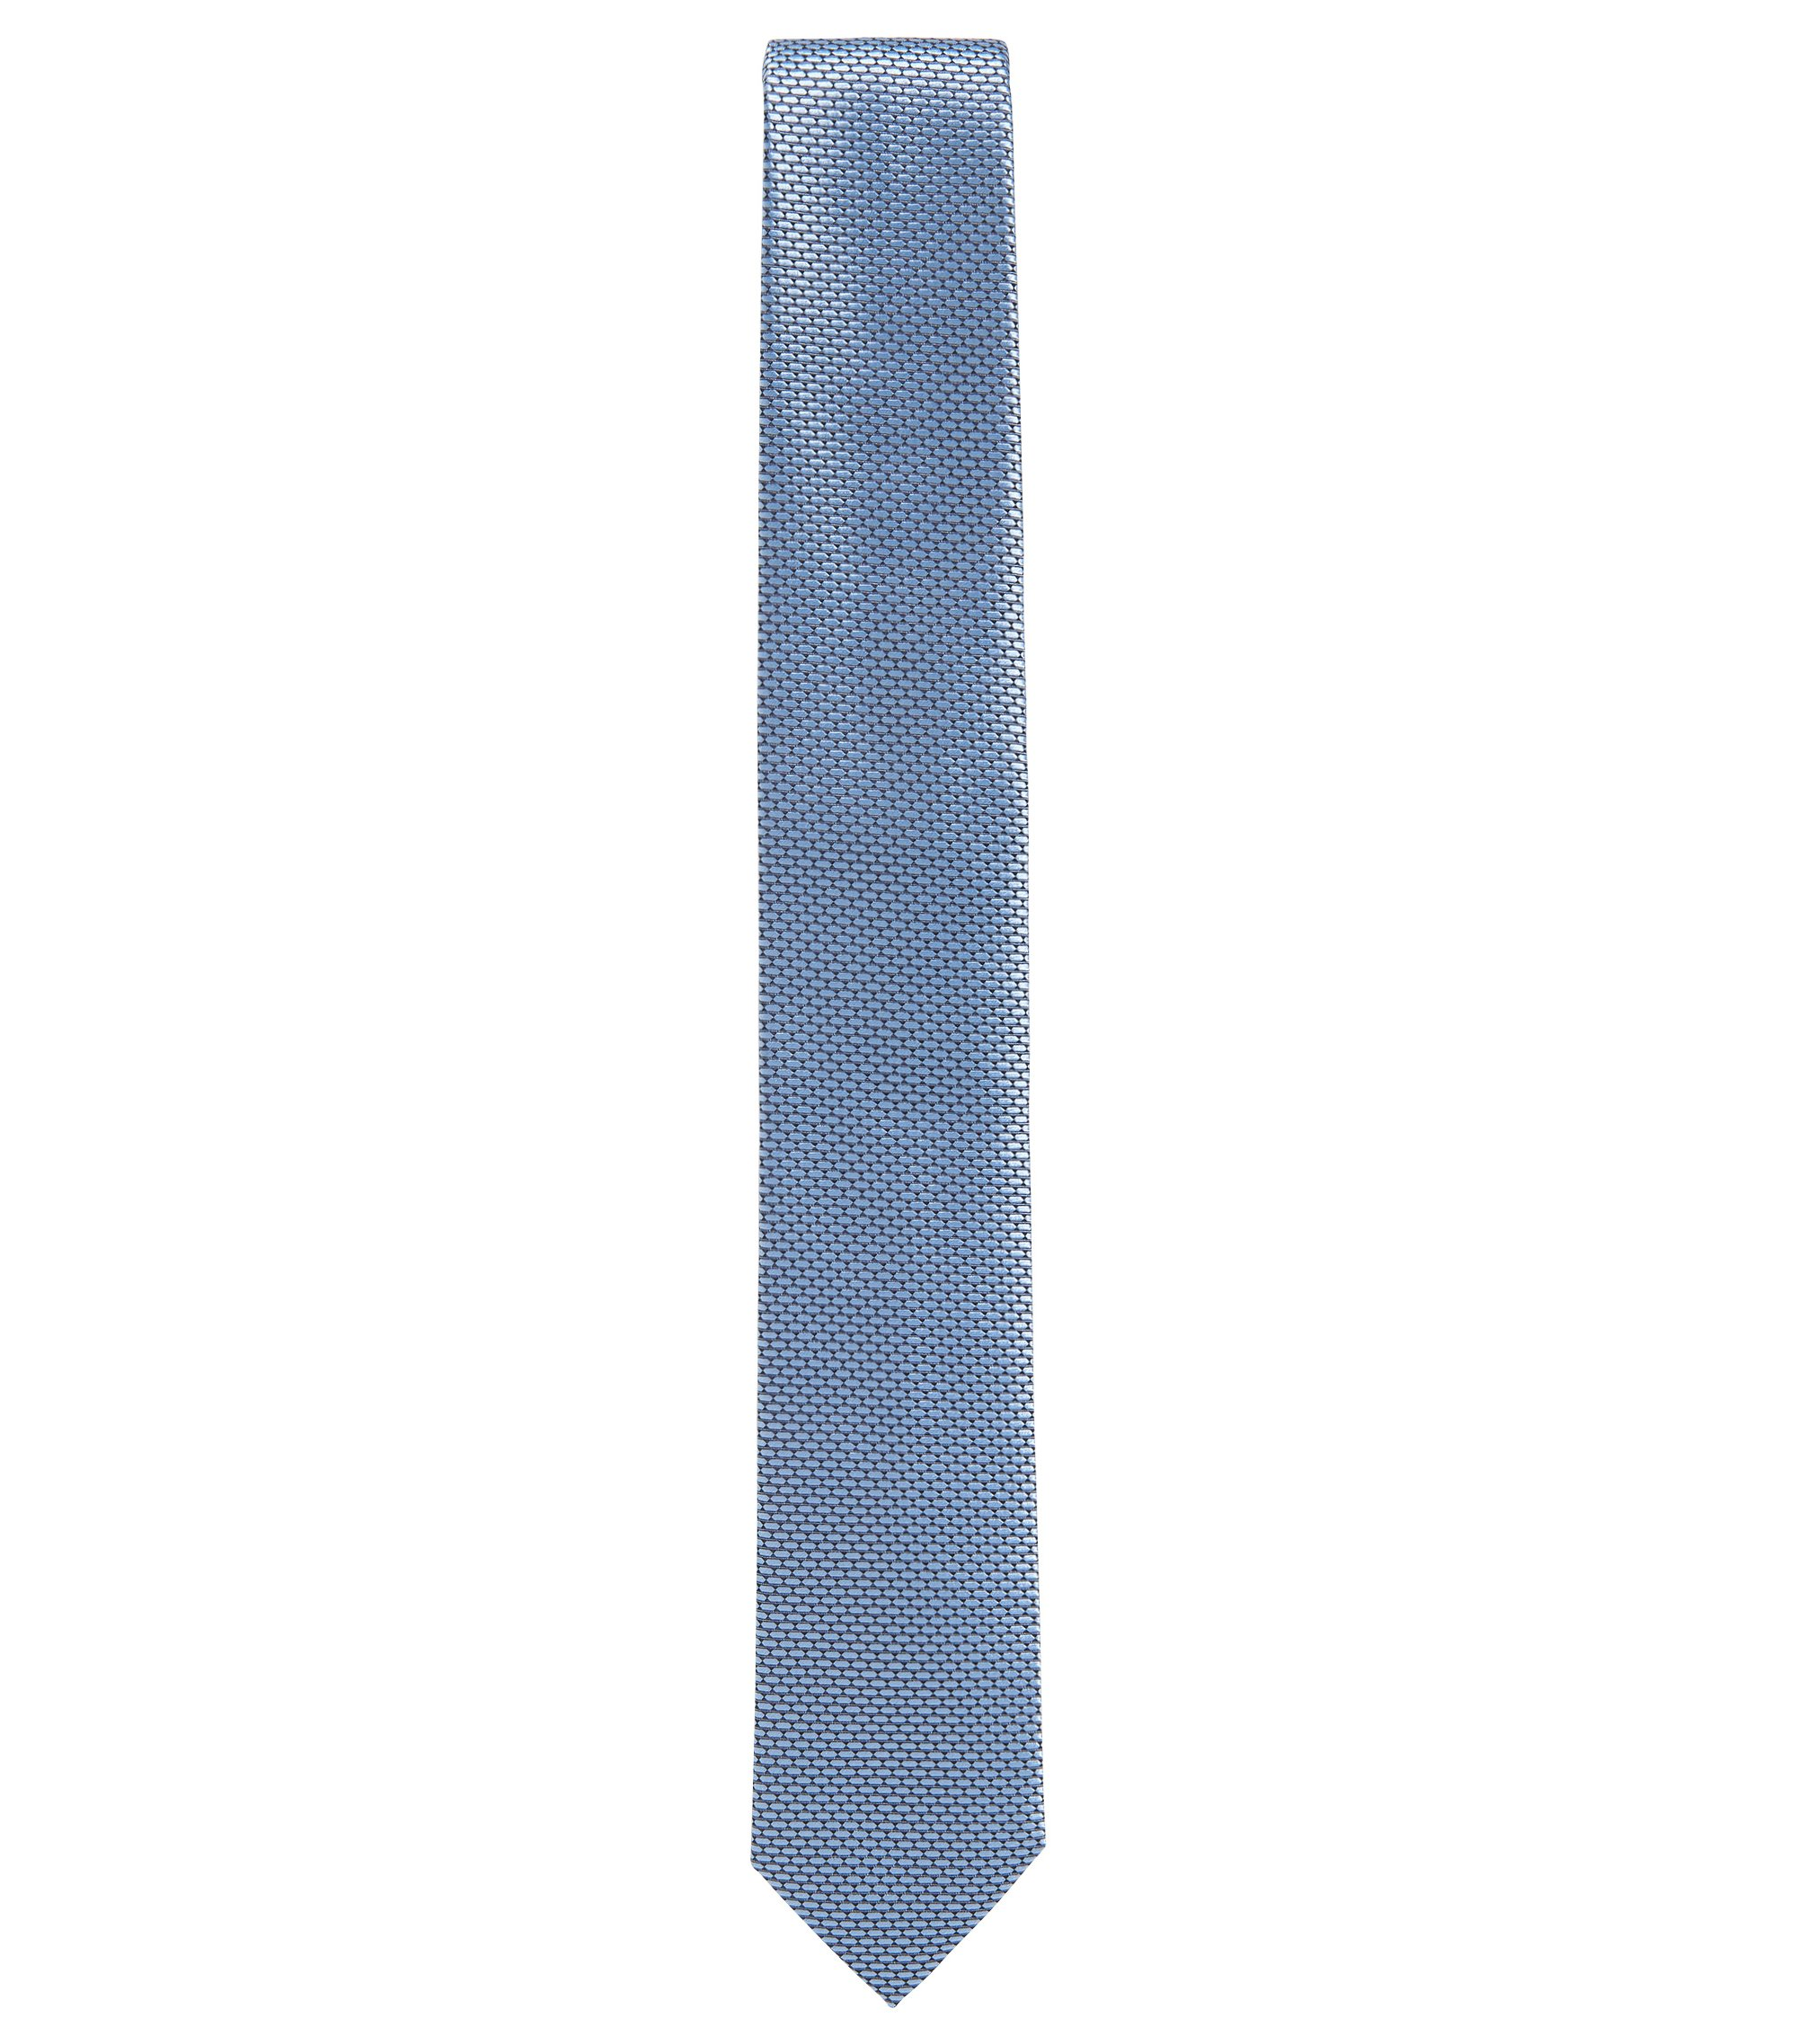 BOSS Tailored Textured Italian Silk Slim Tie, Dark Blue